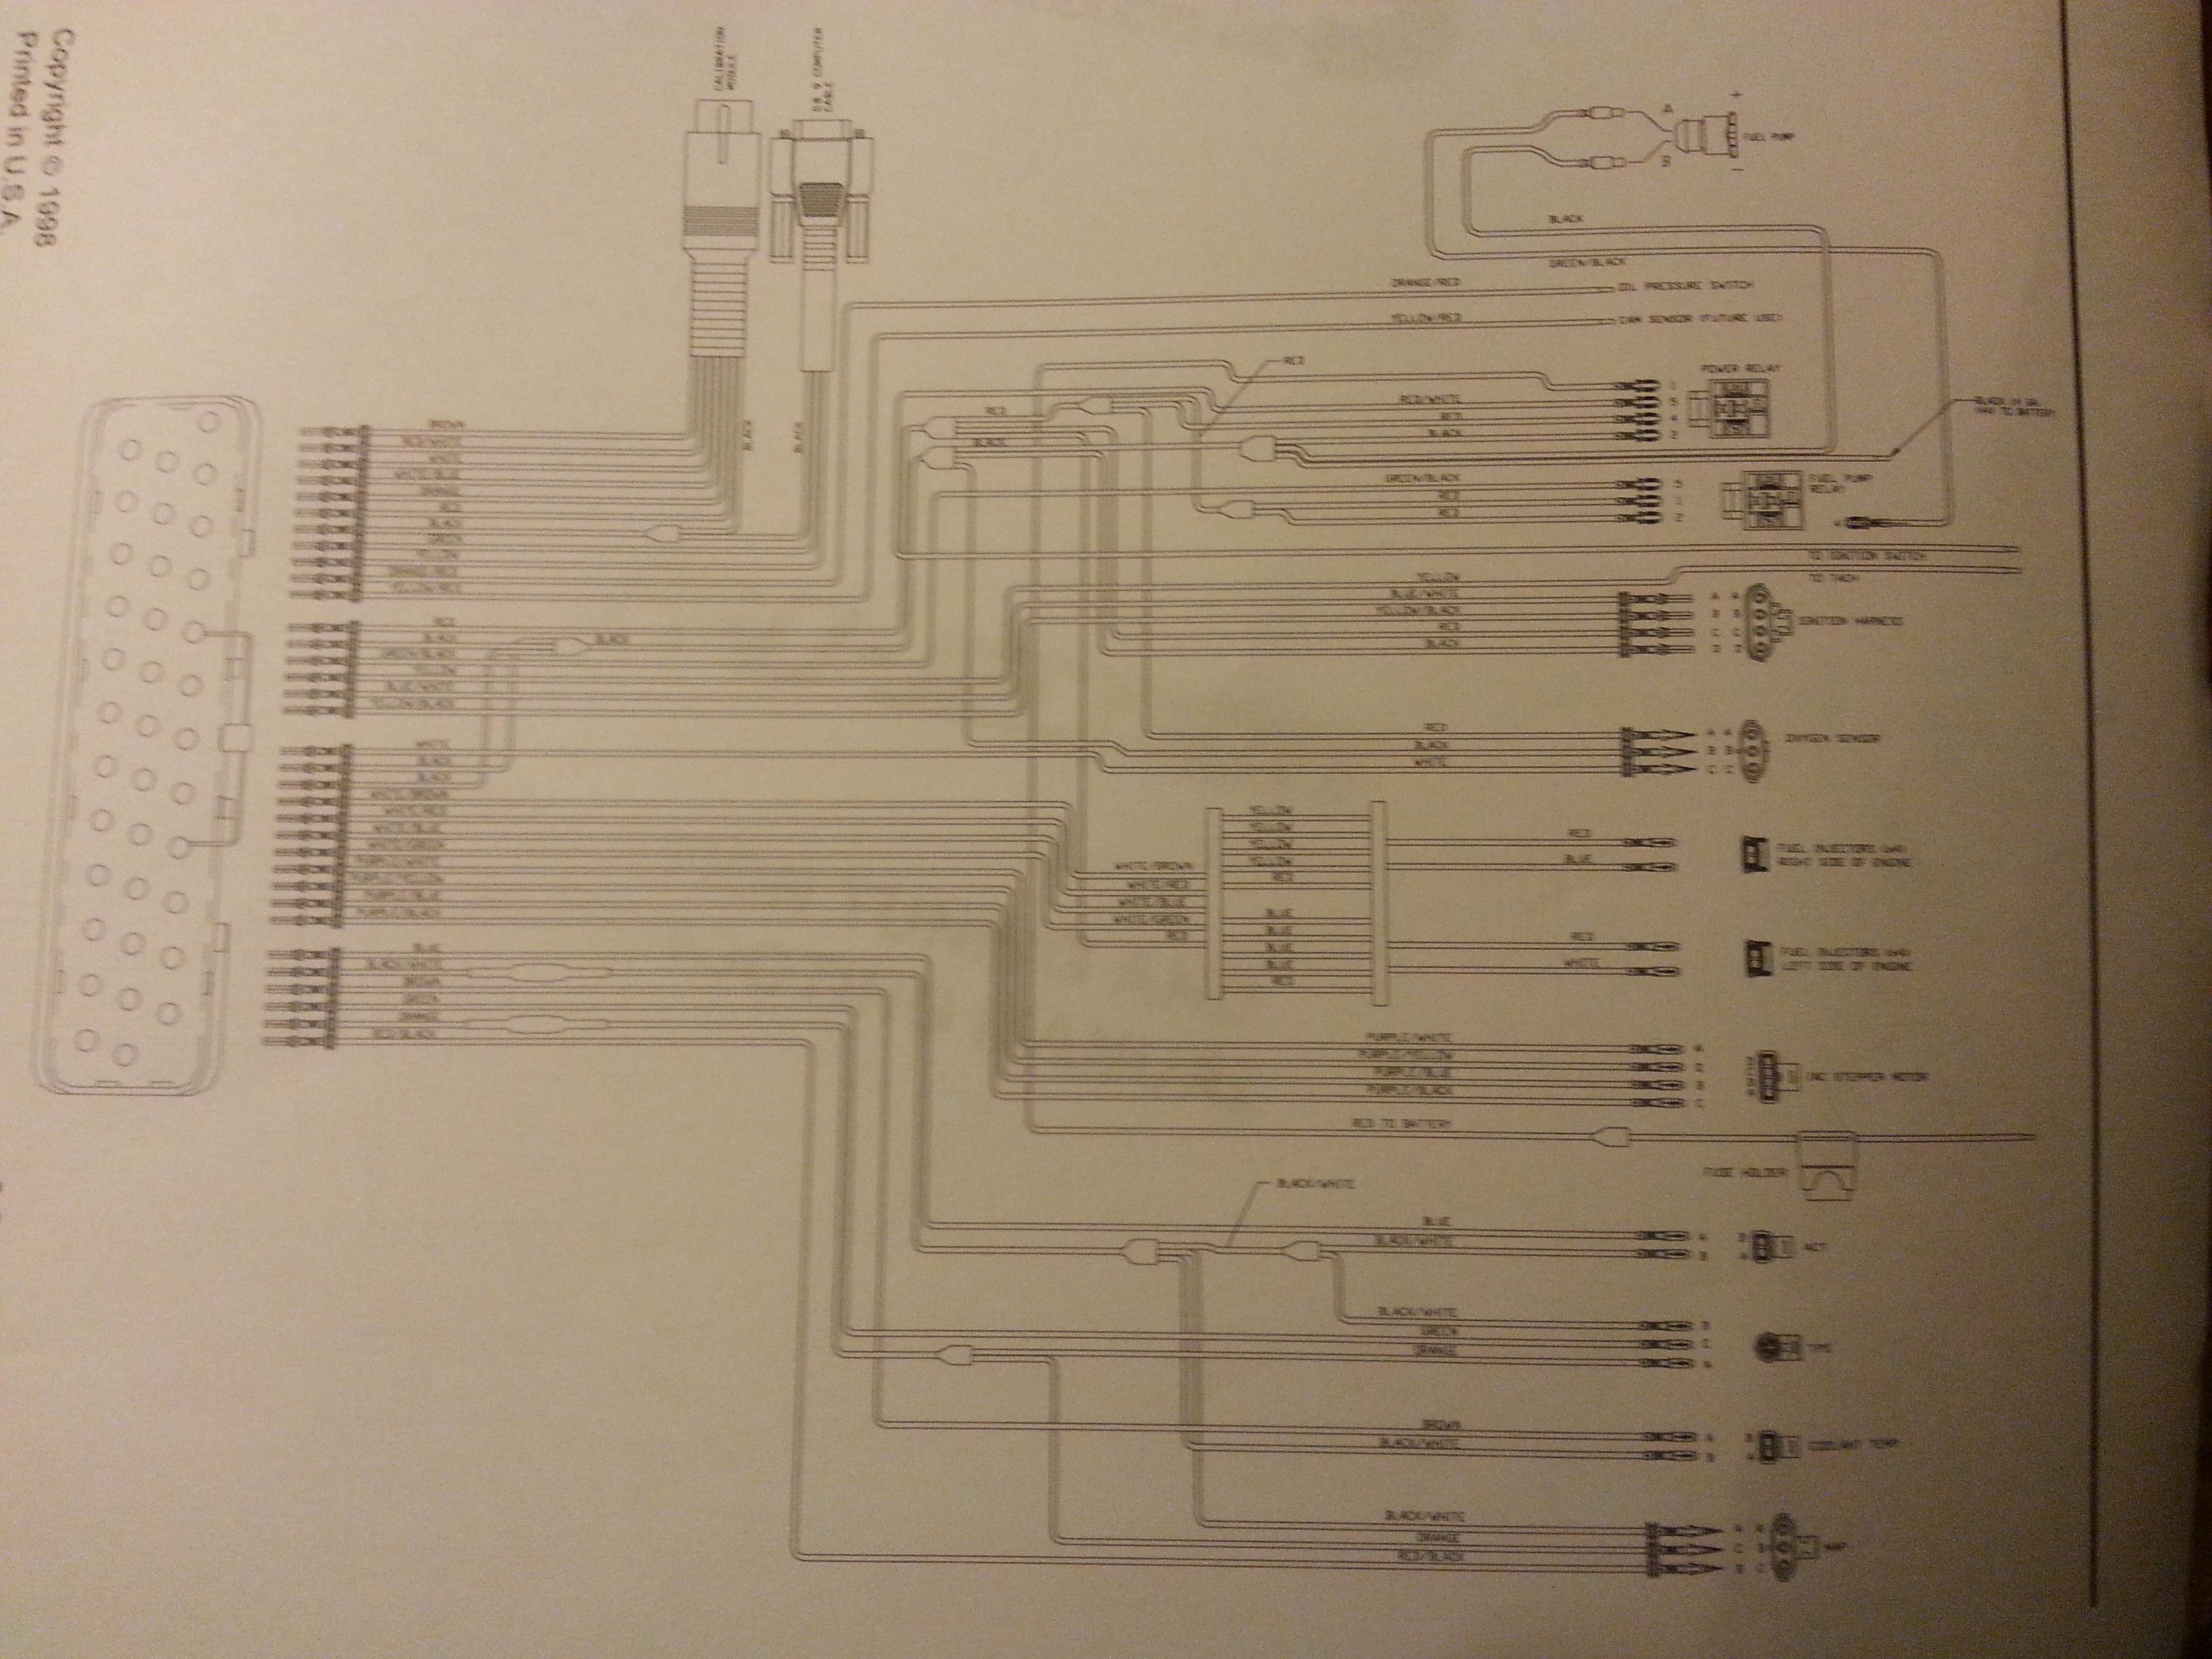 Holley Projection Wiring Diagram Garage Wiring Diagrams 1960 Tekonshaii Nescafe Jeanjaures37 Fr